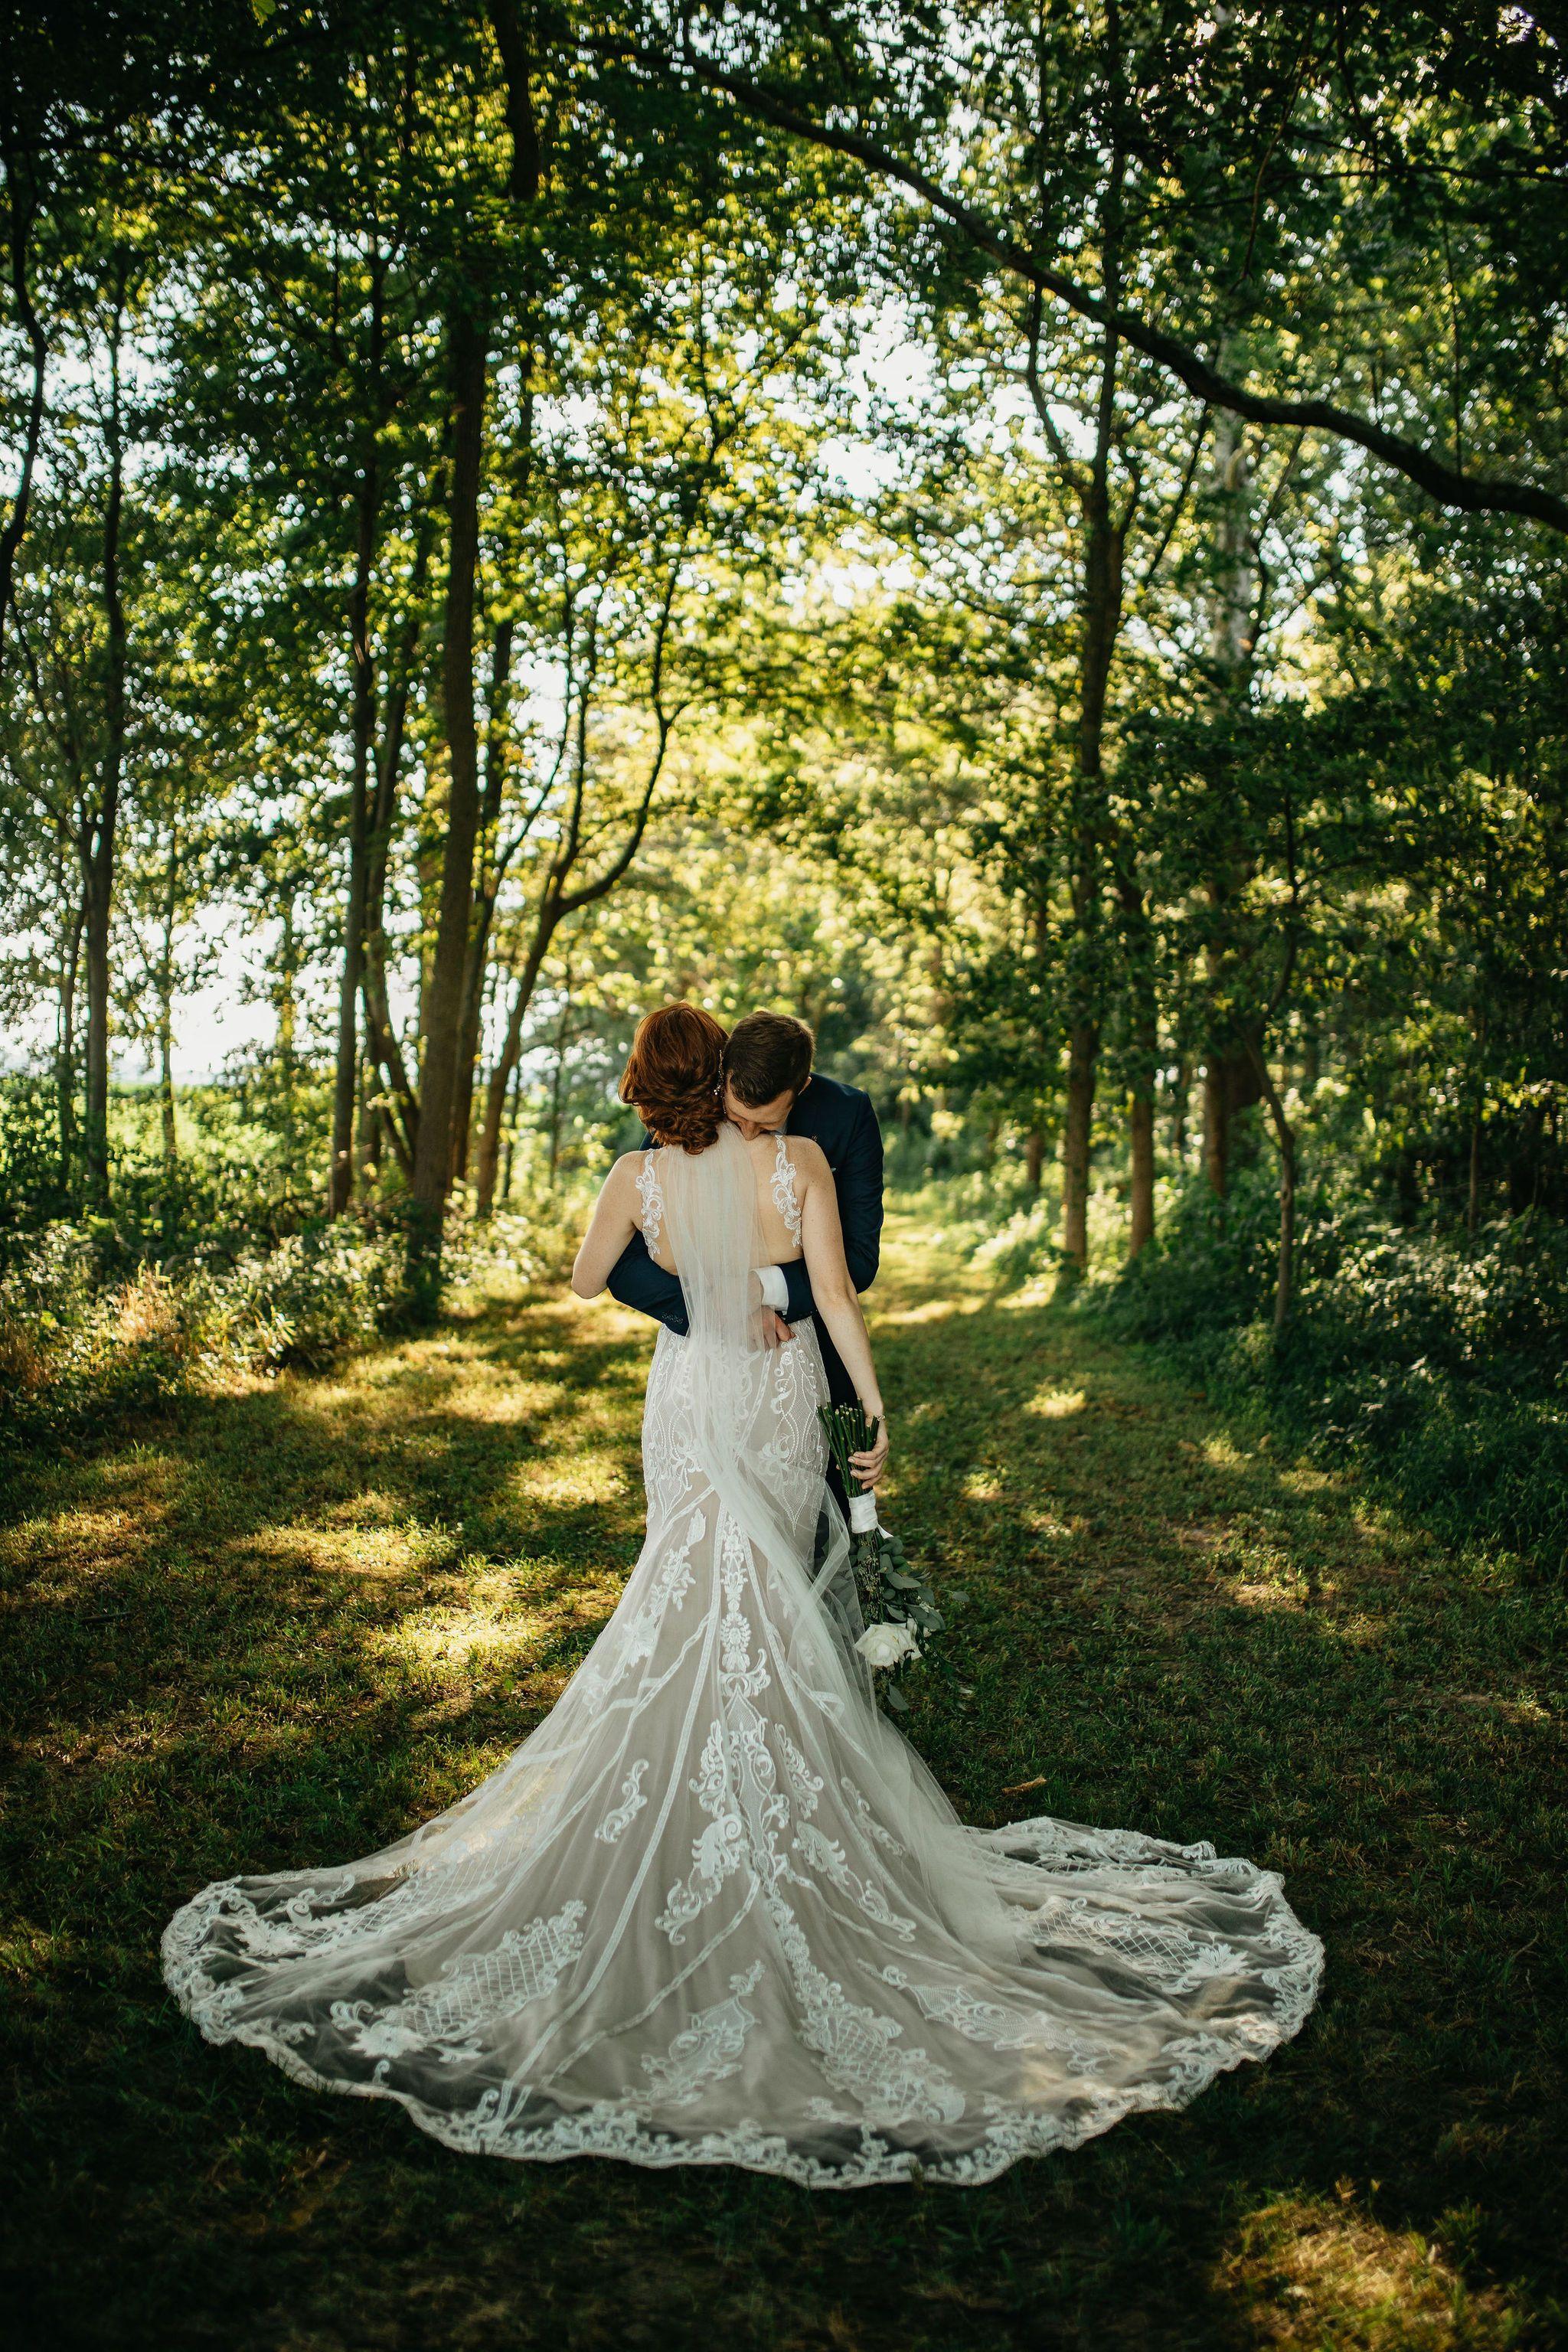 Toledo, Ohio Wedding Photography/Videography by Christina ...